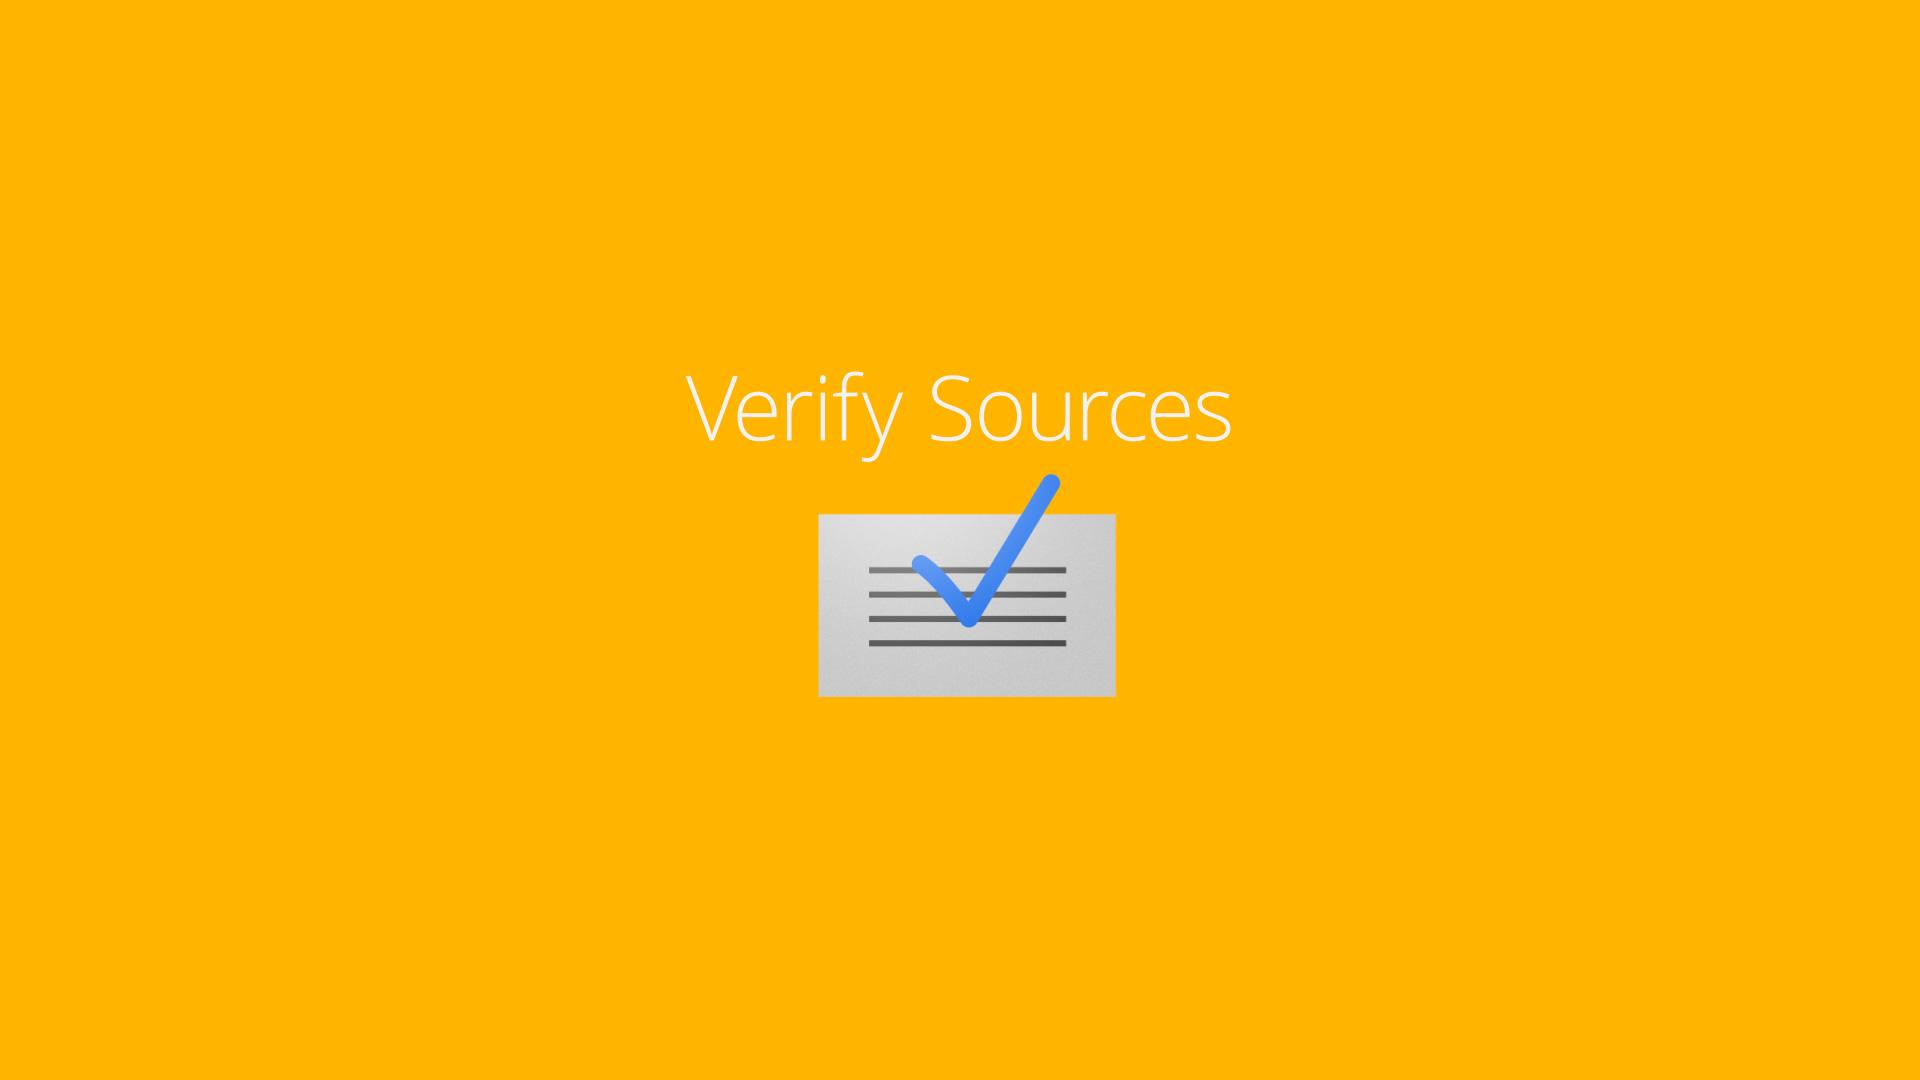 VerifySources.jpg